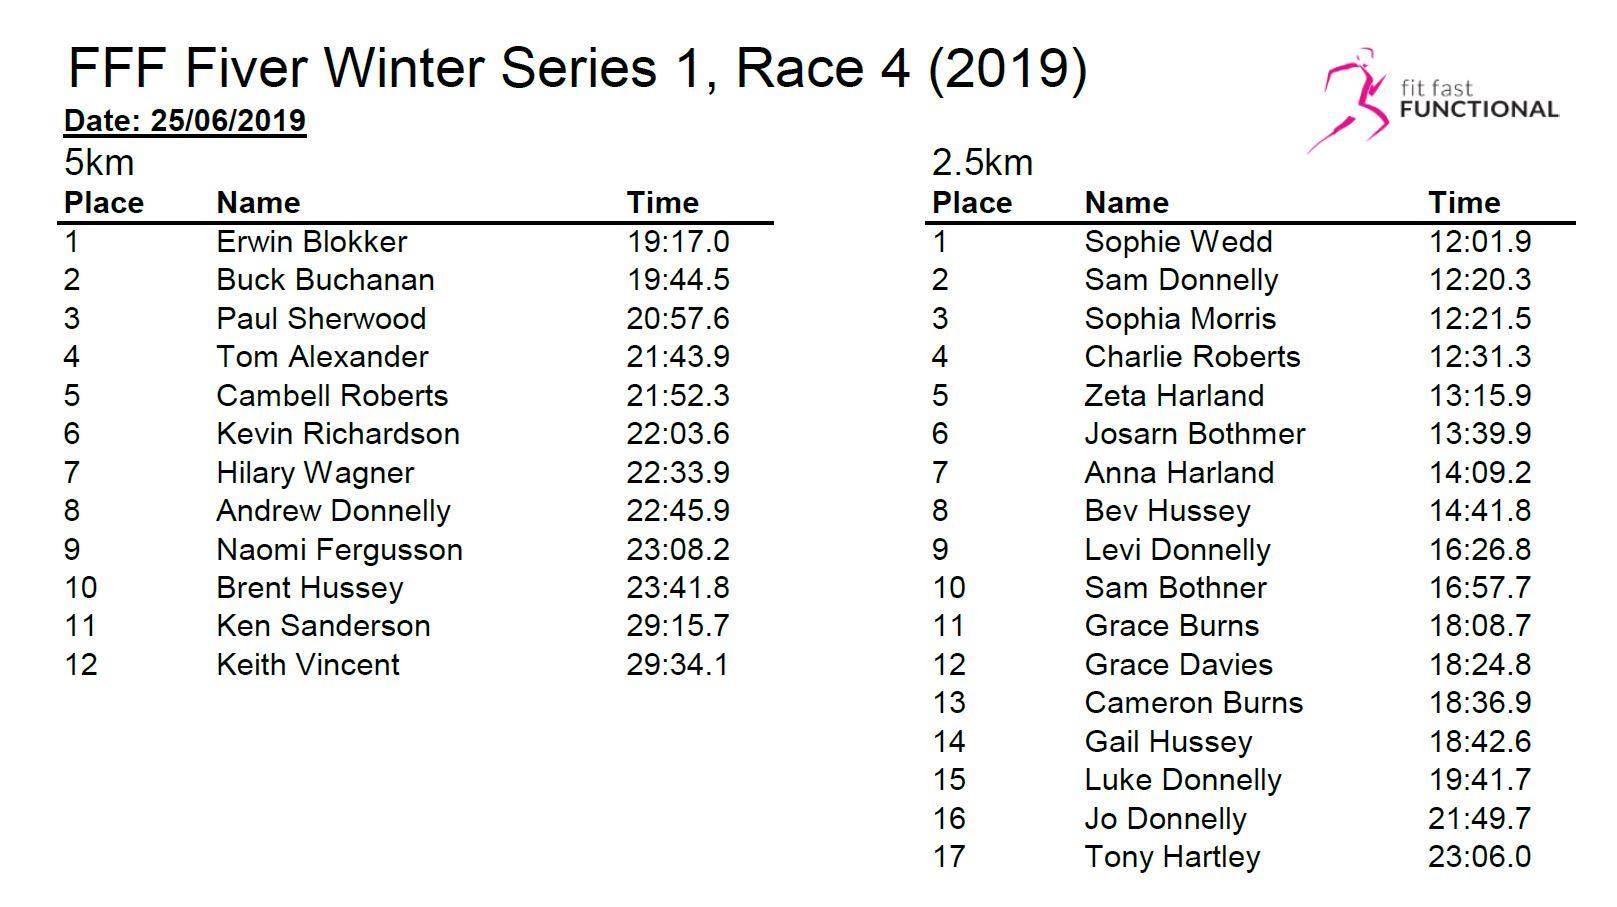 FFF Winter S1 R4 2019 (002)